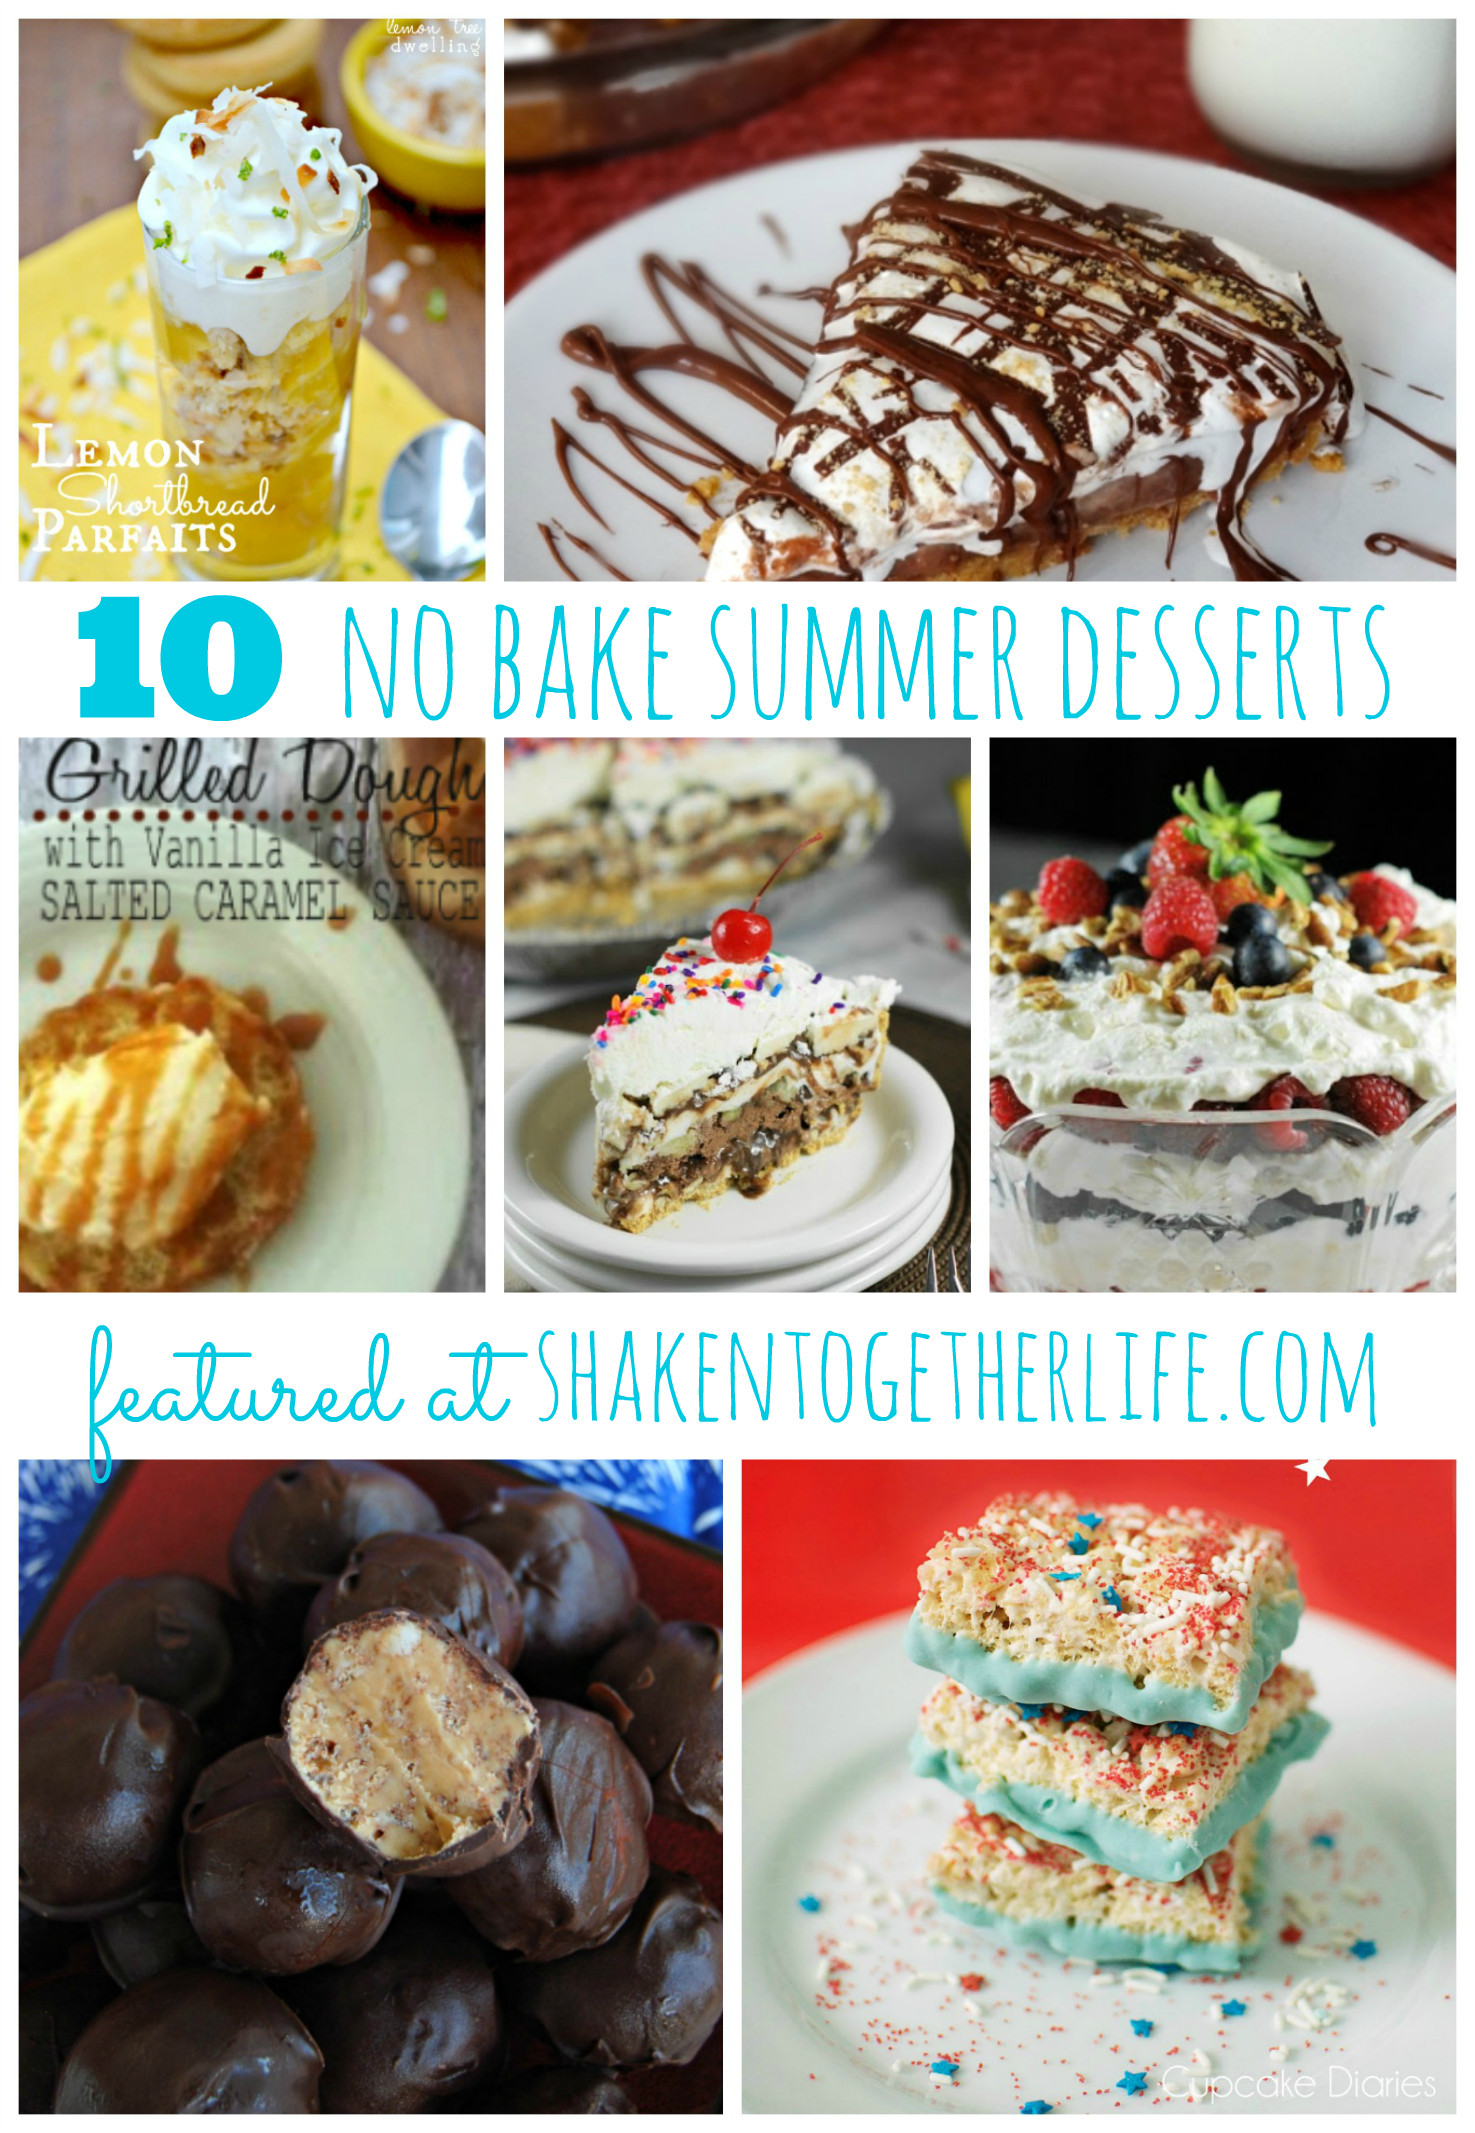 Summer Desserts No Bake  10 No Bake Desserts for Summer at Shaken To her